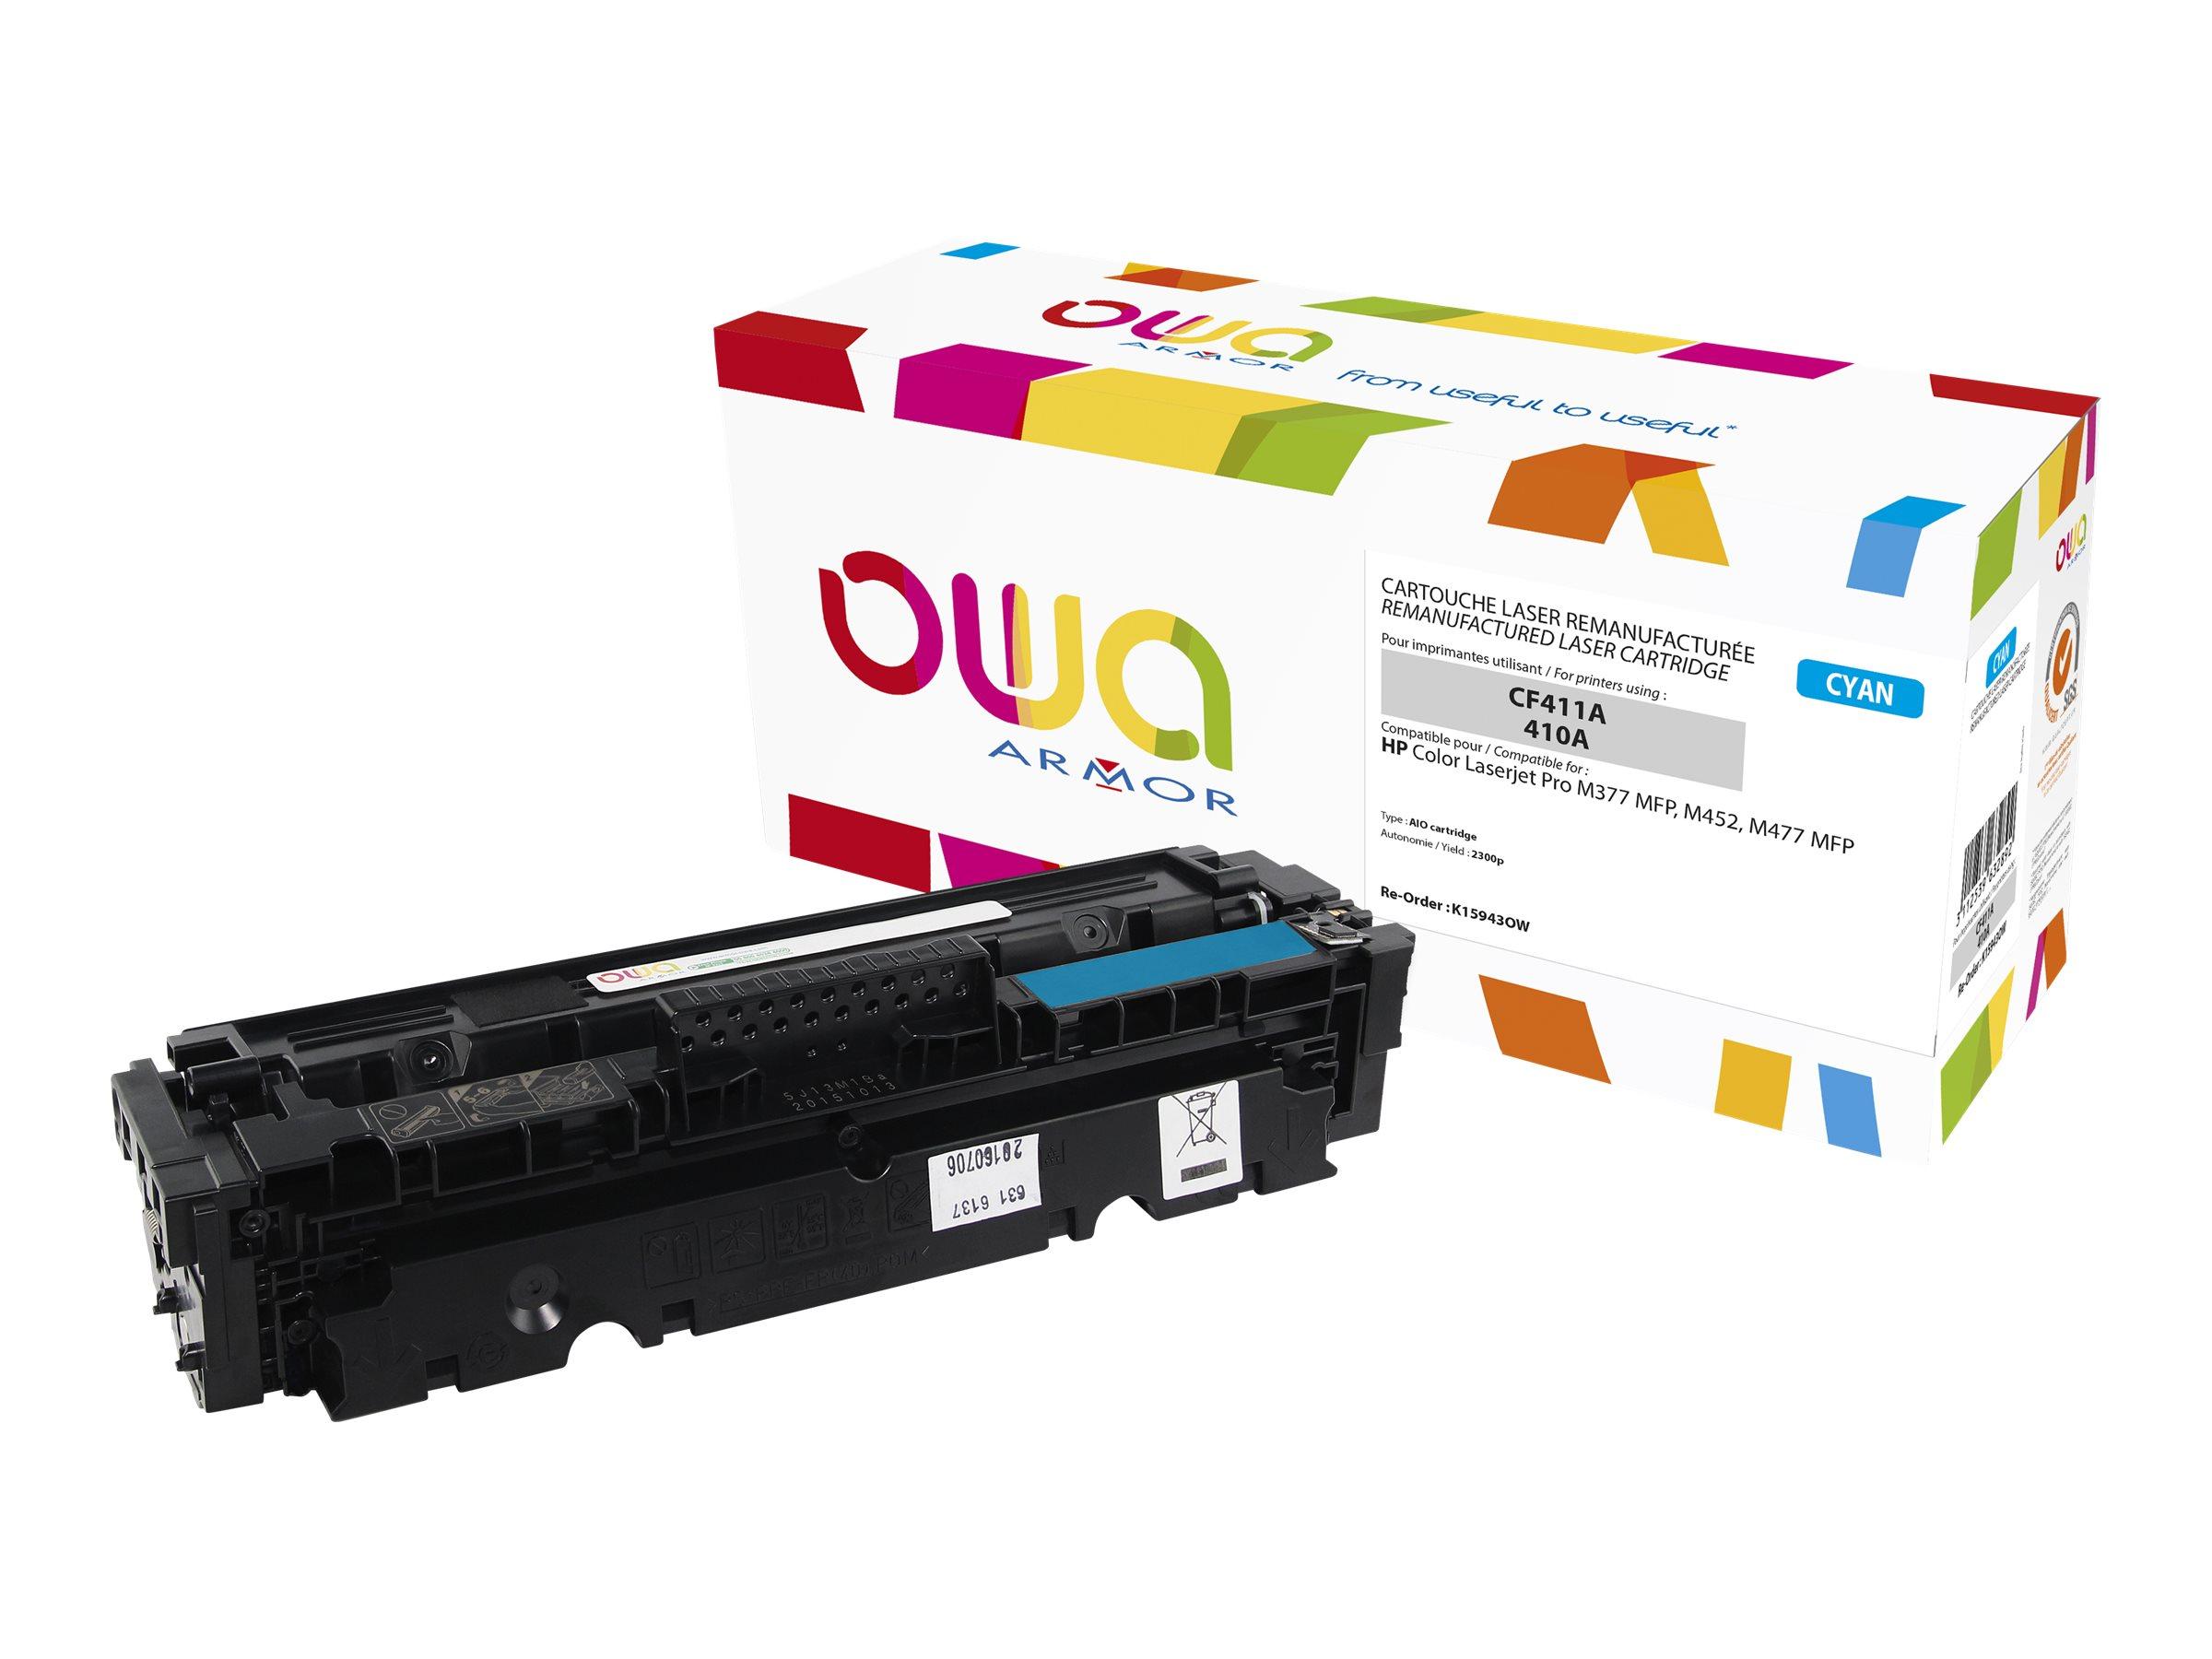 Owa K15943OW cartouche équivalente HP 410A - cyan